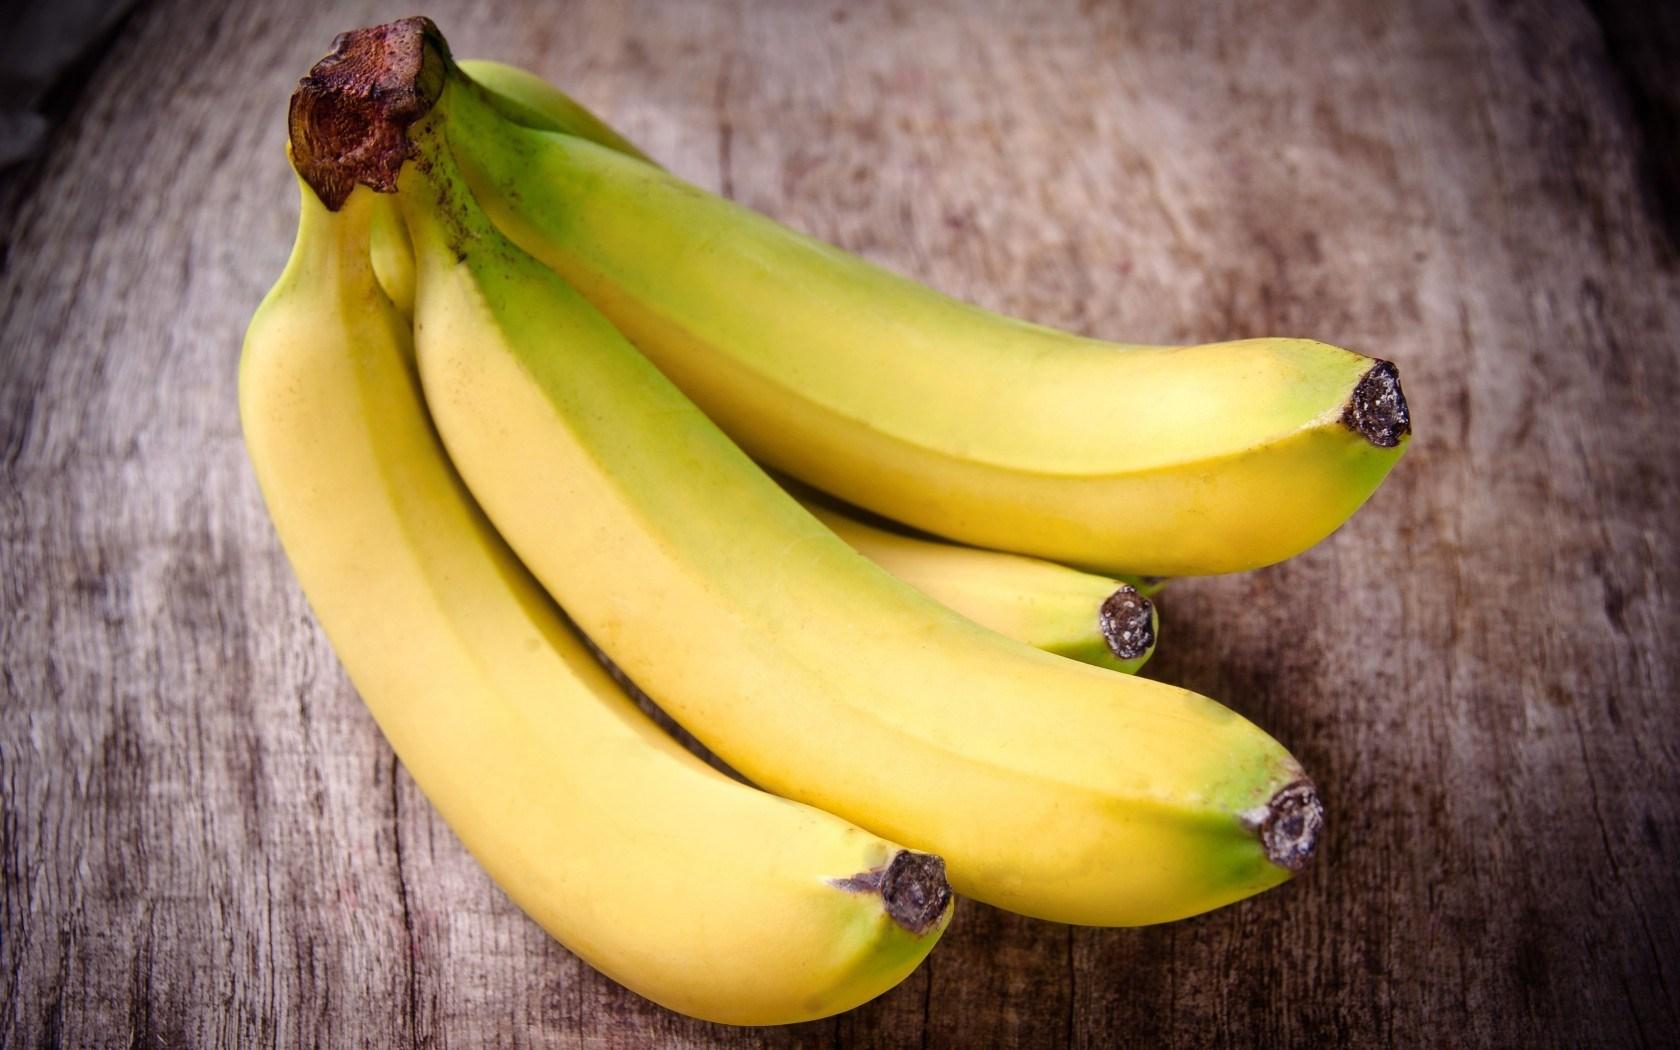 LT-bananas_0.jpg